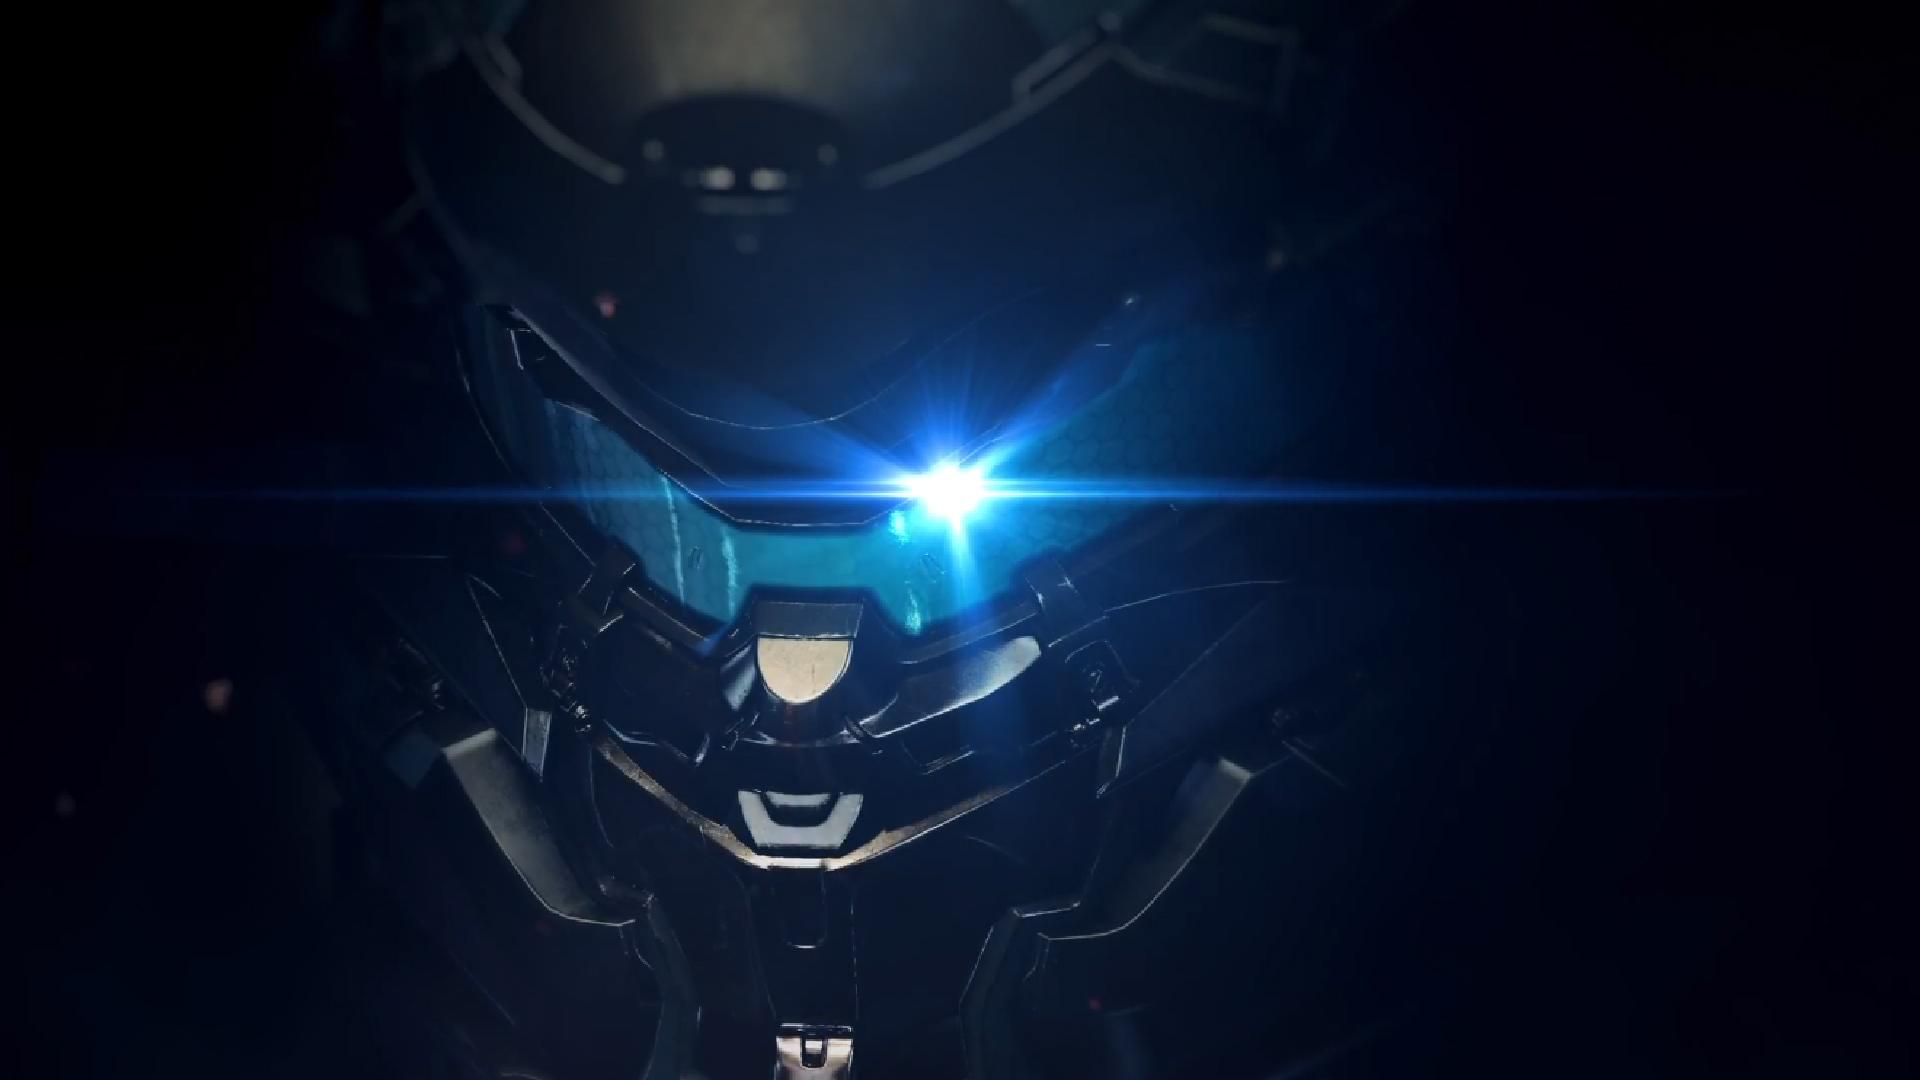 Halo 5 animated wallpaper wallpapersafari - Halo 5 guardians wallpaper 1920x1080 ...